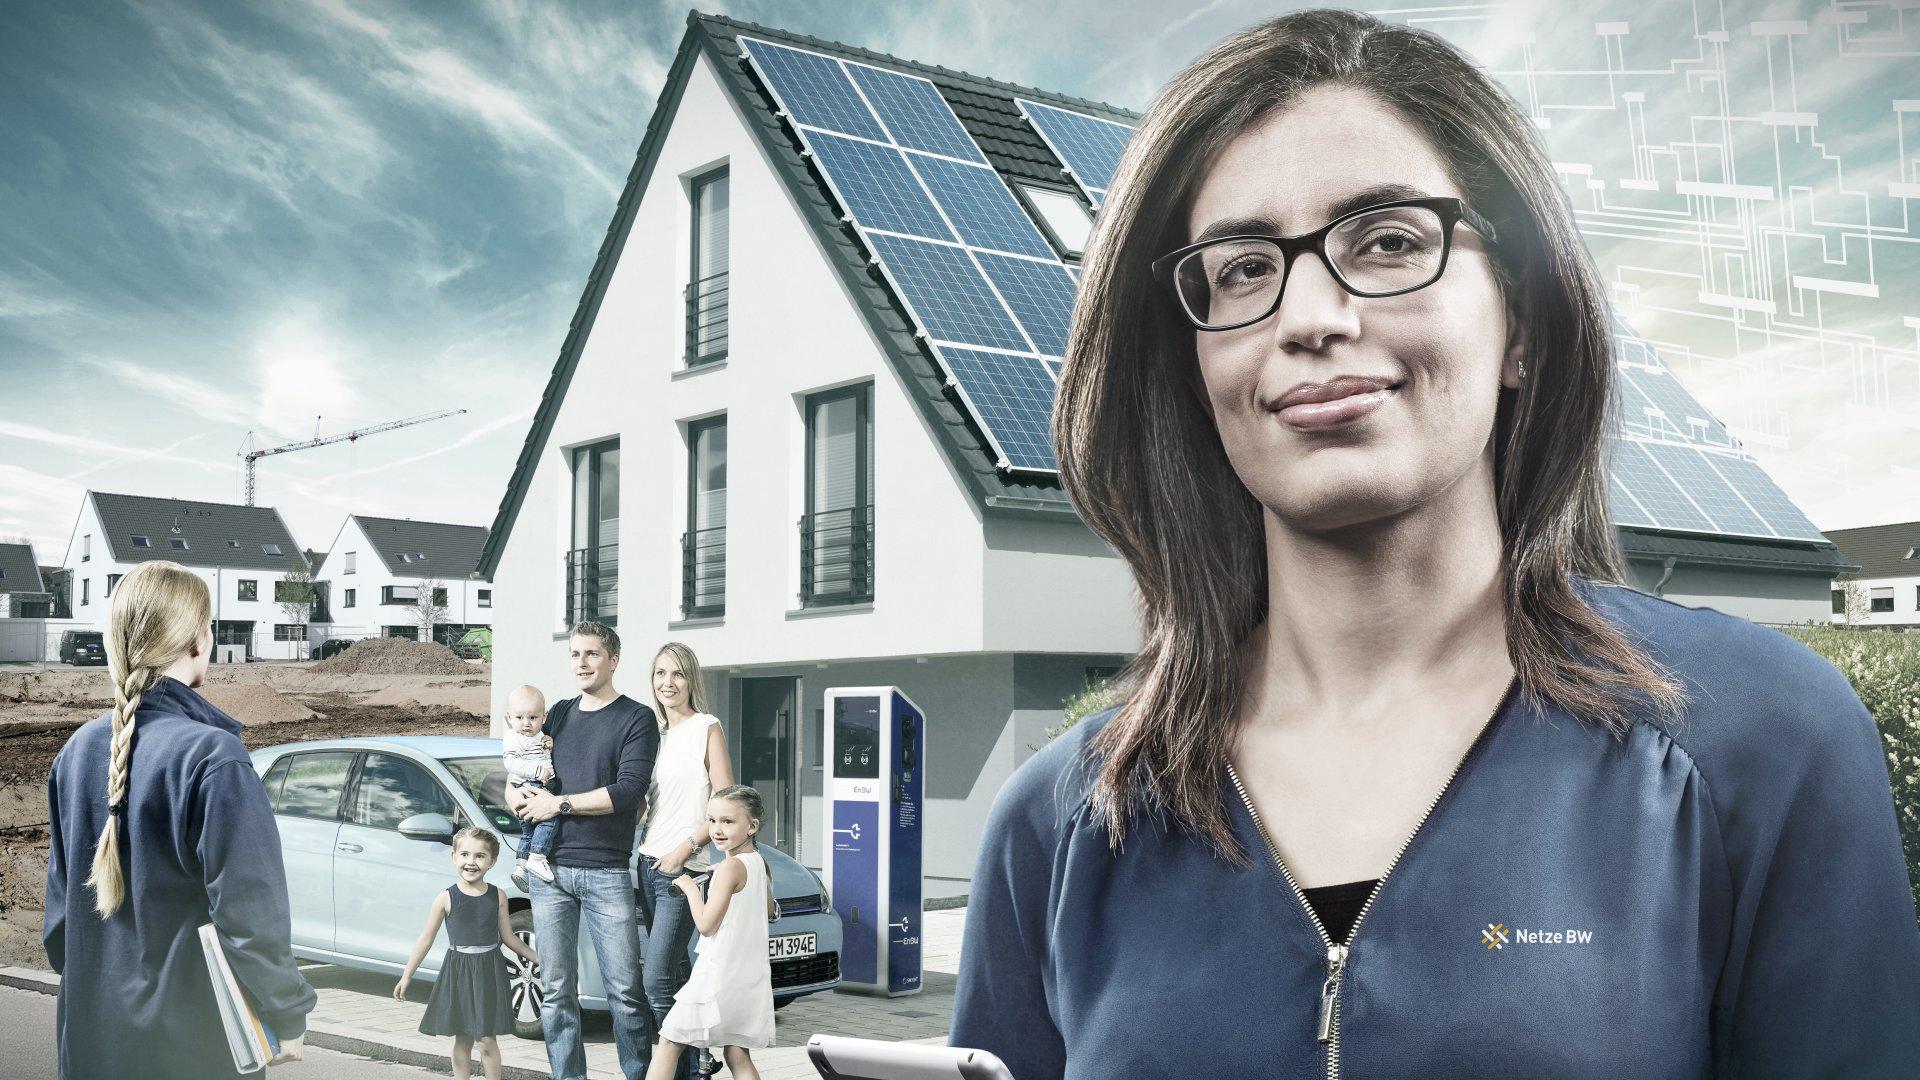 Hausanschluss anmelden - Netze BW GmbH